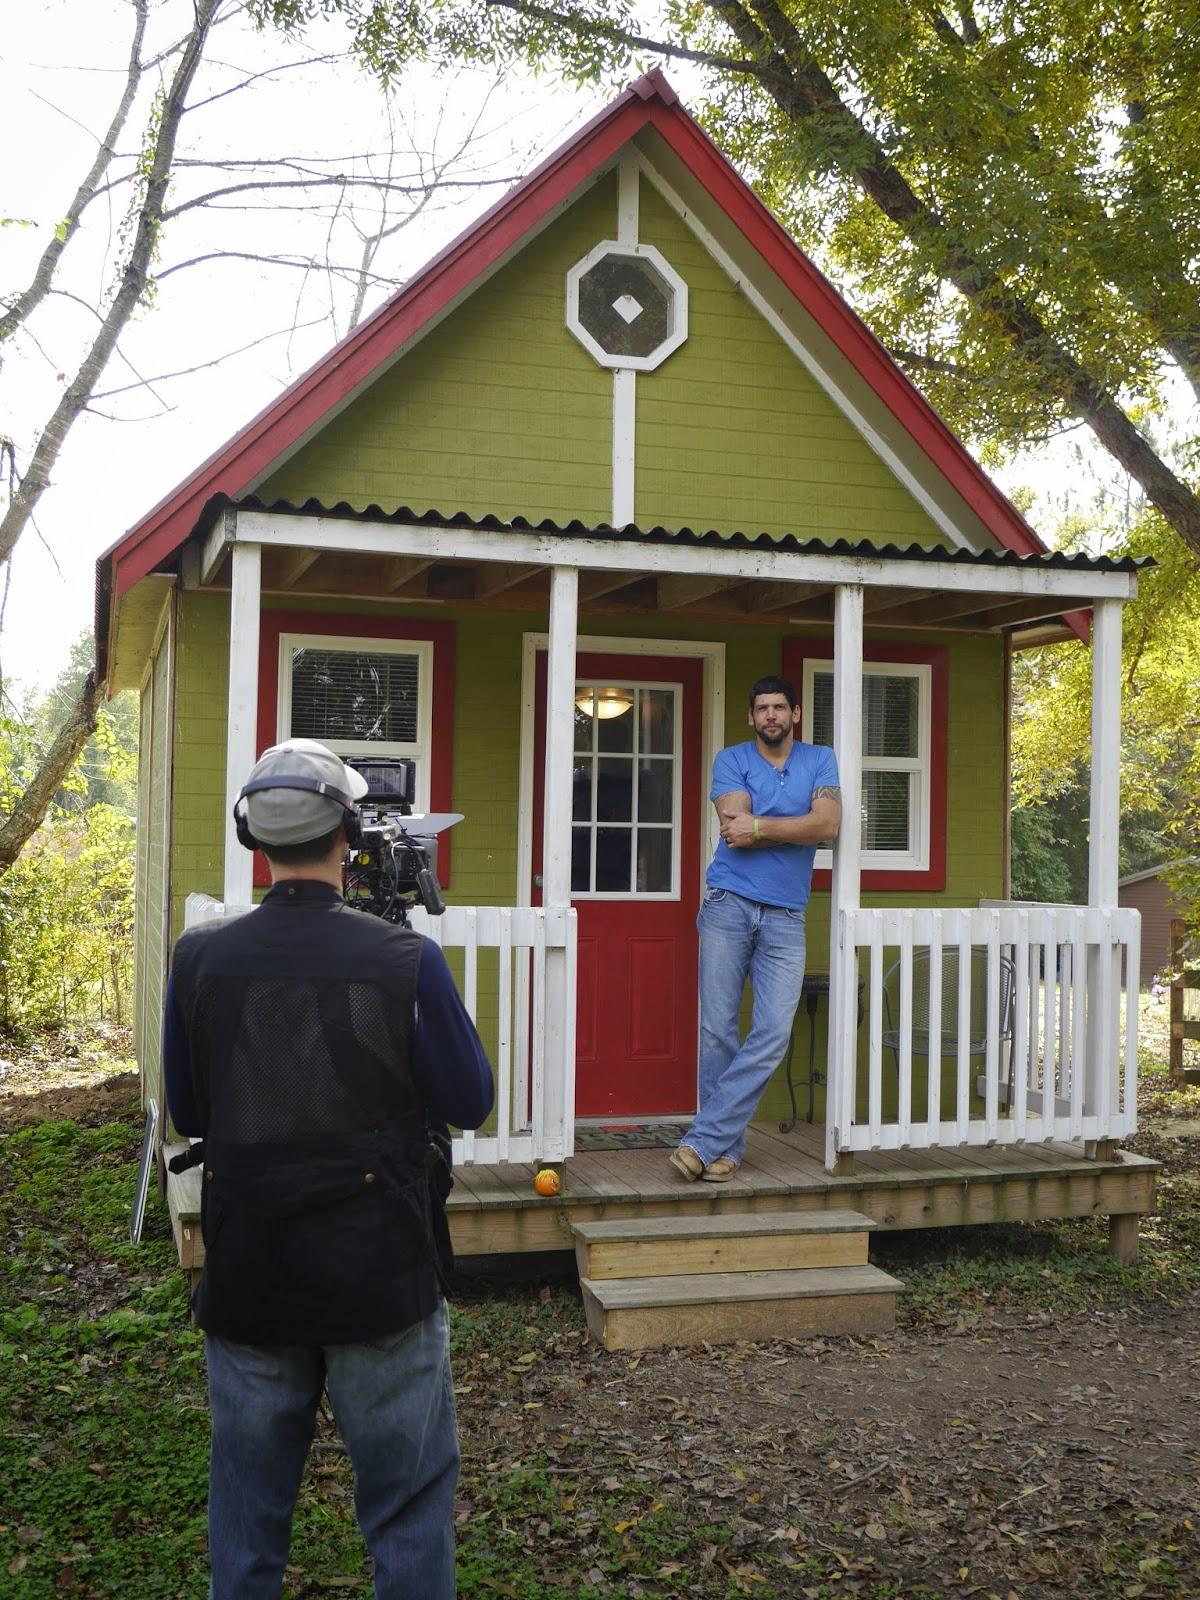 Relaxshackscom TINY HOUSE BUILDING and DESIGN WORKSHOP 3 Days w